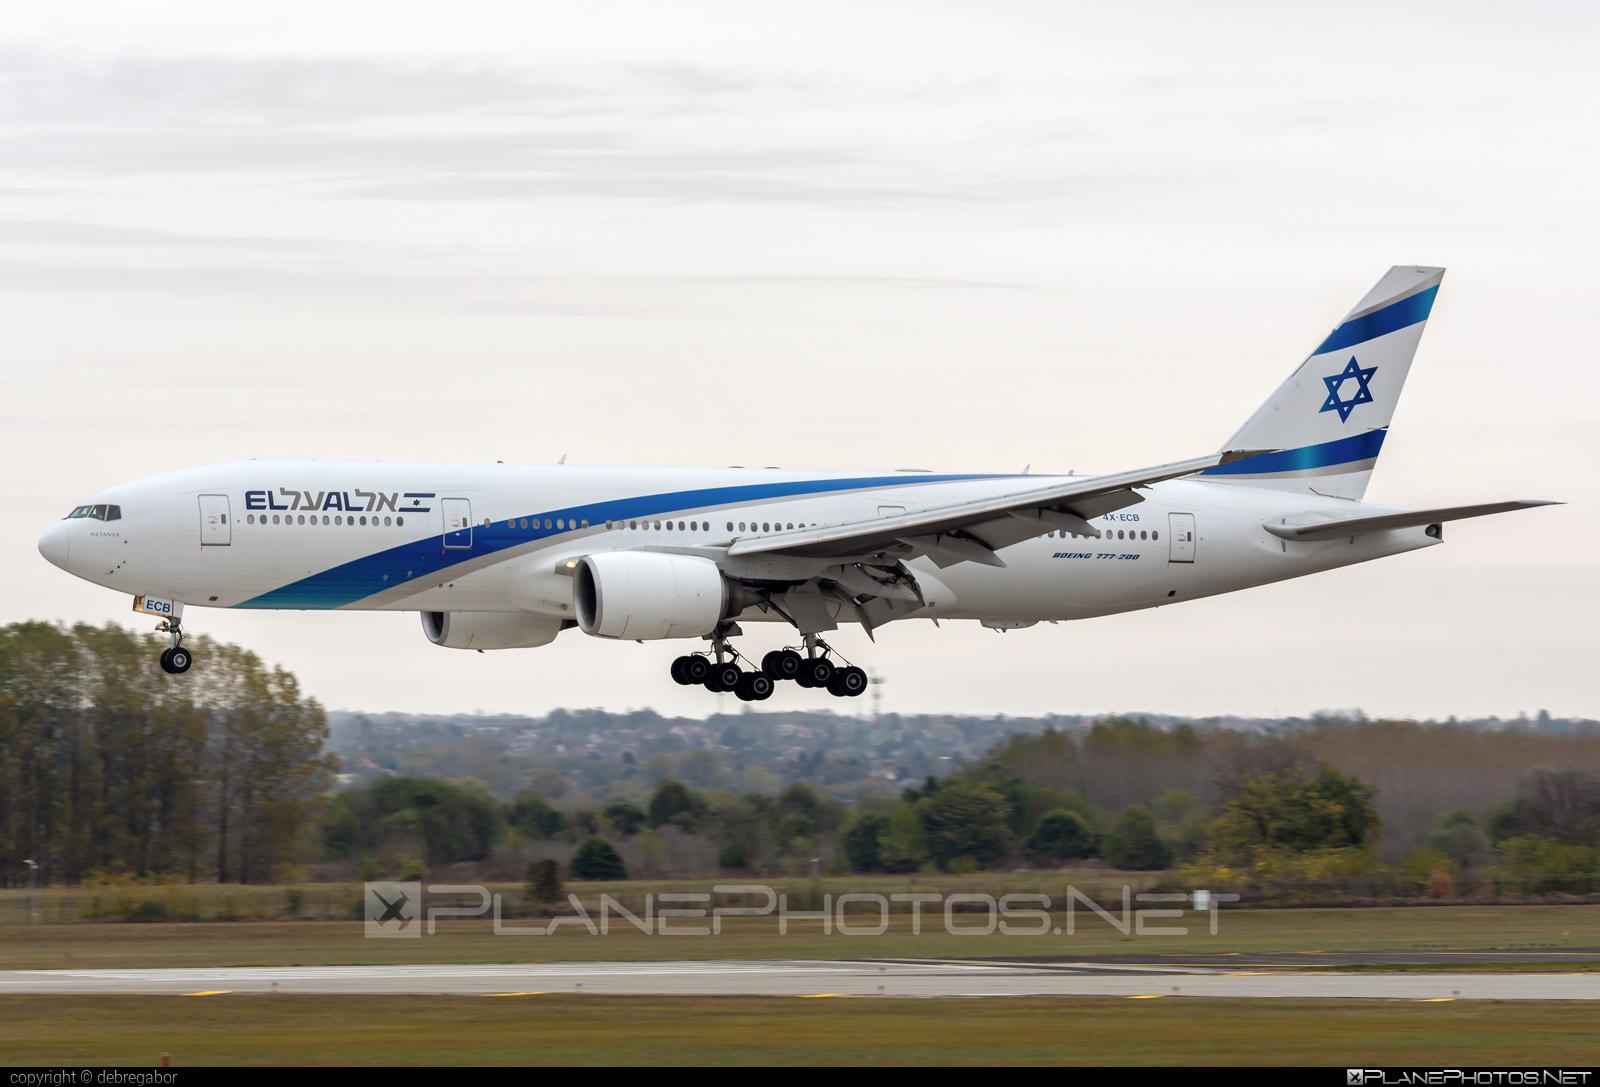 Boeing 777-200ER - 4X-ECB operated by El Al Israel Airlines #b777 #b777er #boeing #boeing777 #elal #elalisraelairlines #israelairlines #tripleseven